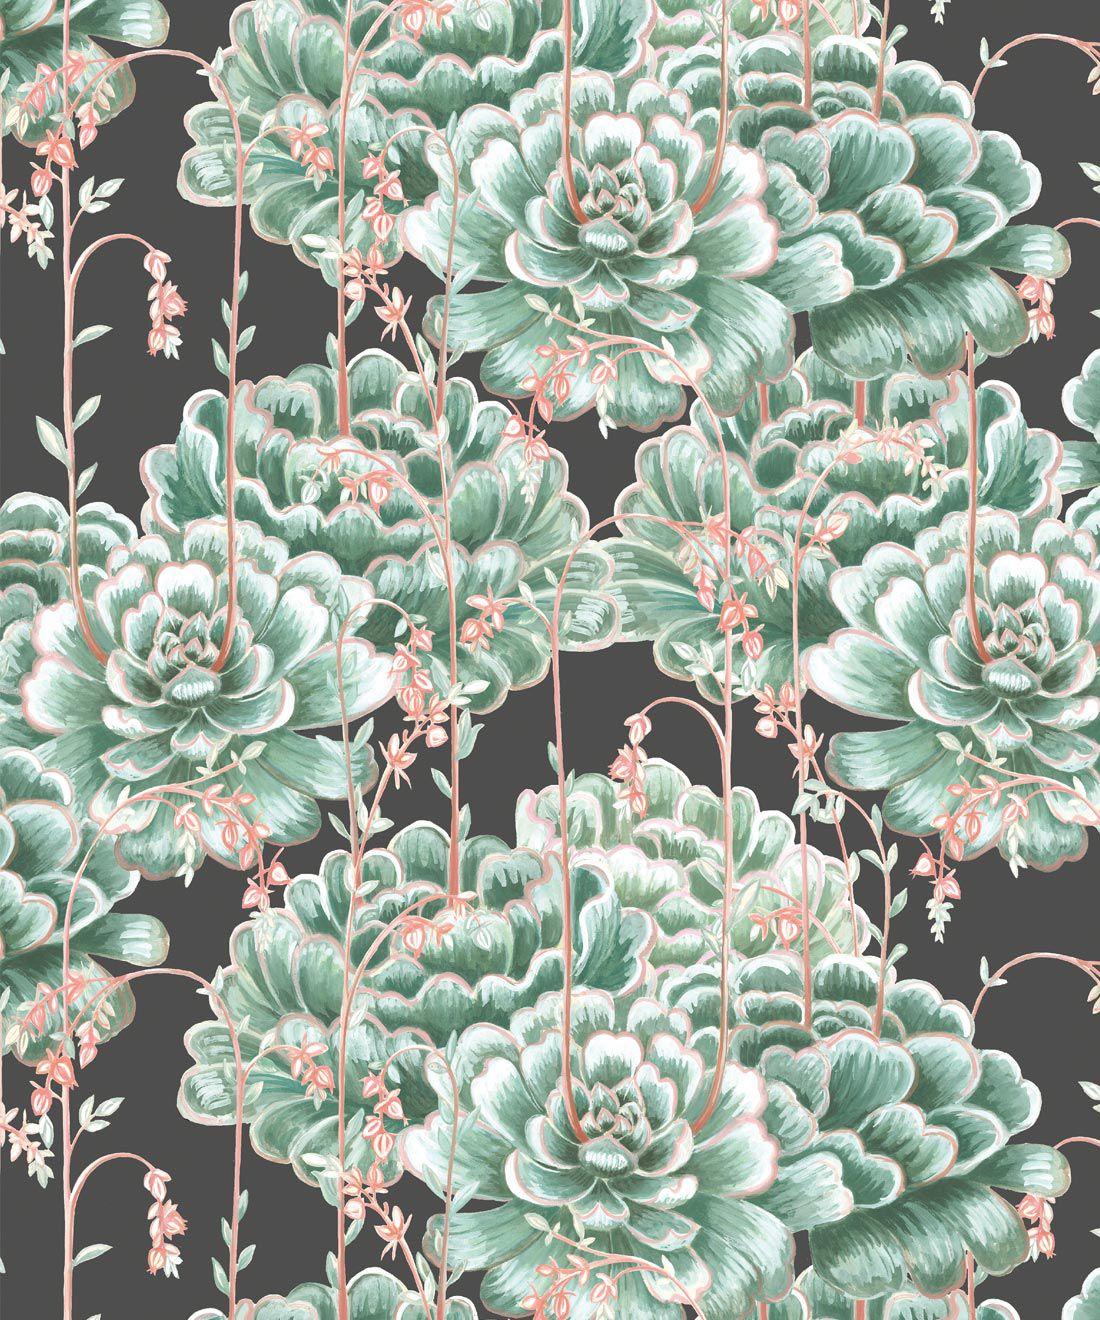 Succulents Wallpaper Green Charcoal • Cactus Wallpaper • Desert Wallpaper Swatch on black background